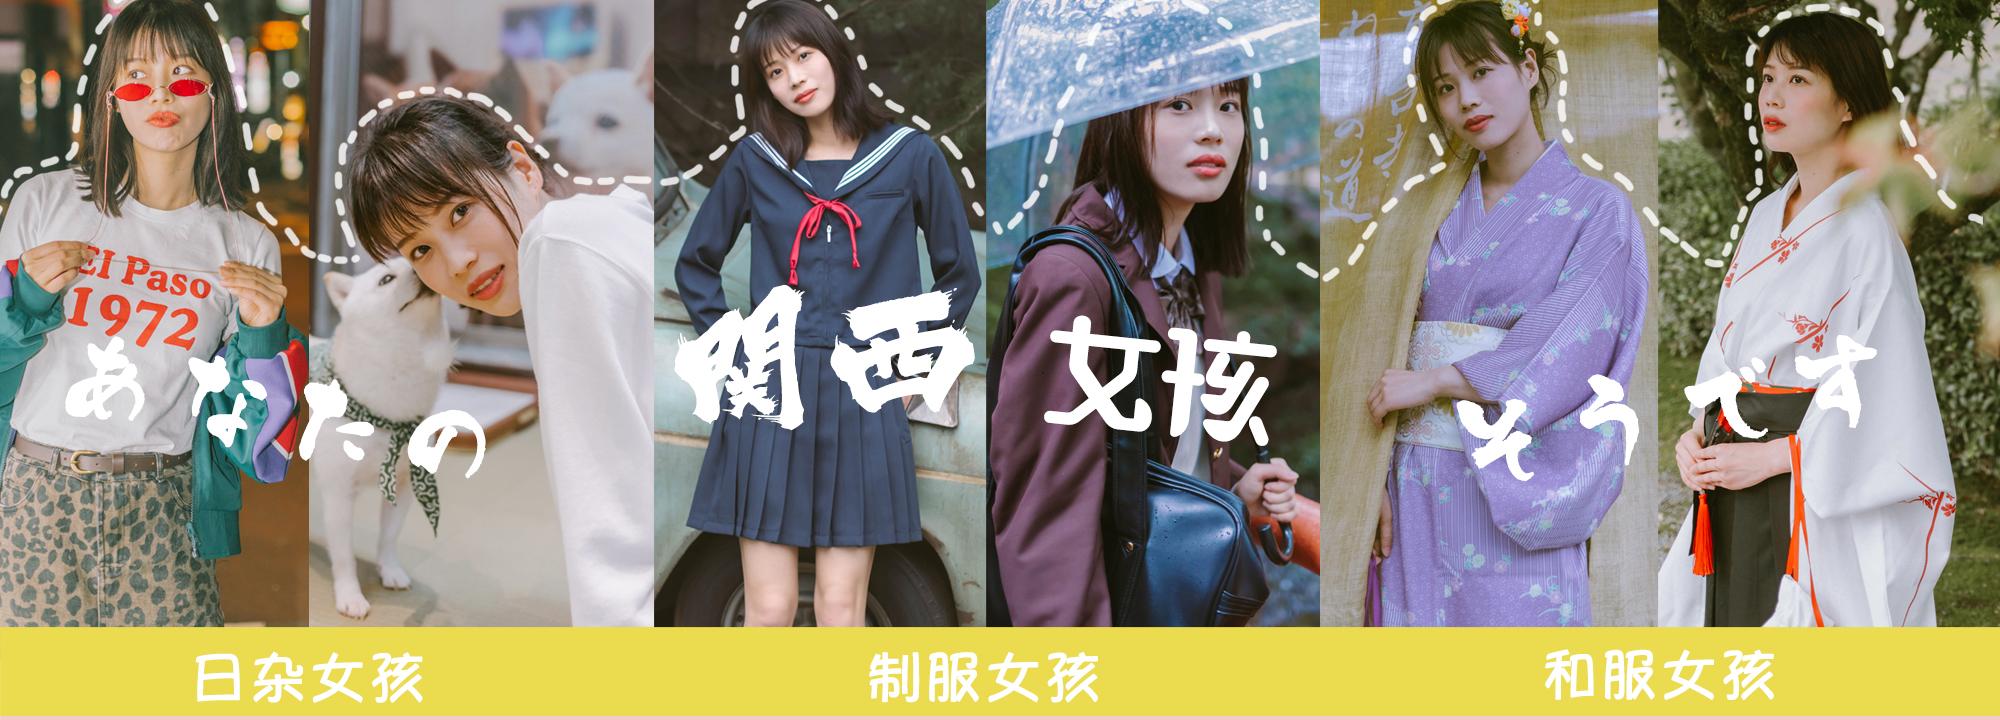 【撸猫撸狗】-【大阪の日杂女孩】-【奈良の制服女孩】-【京都の和服女孩】